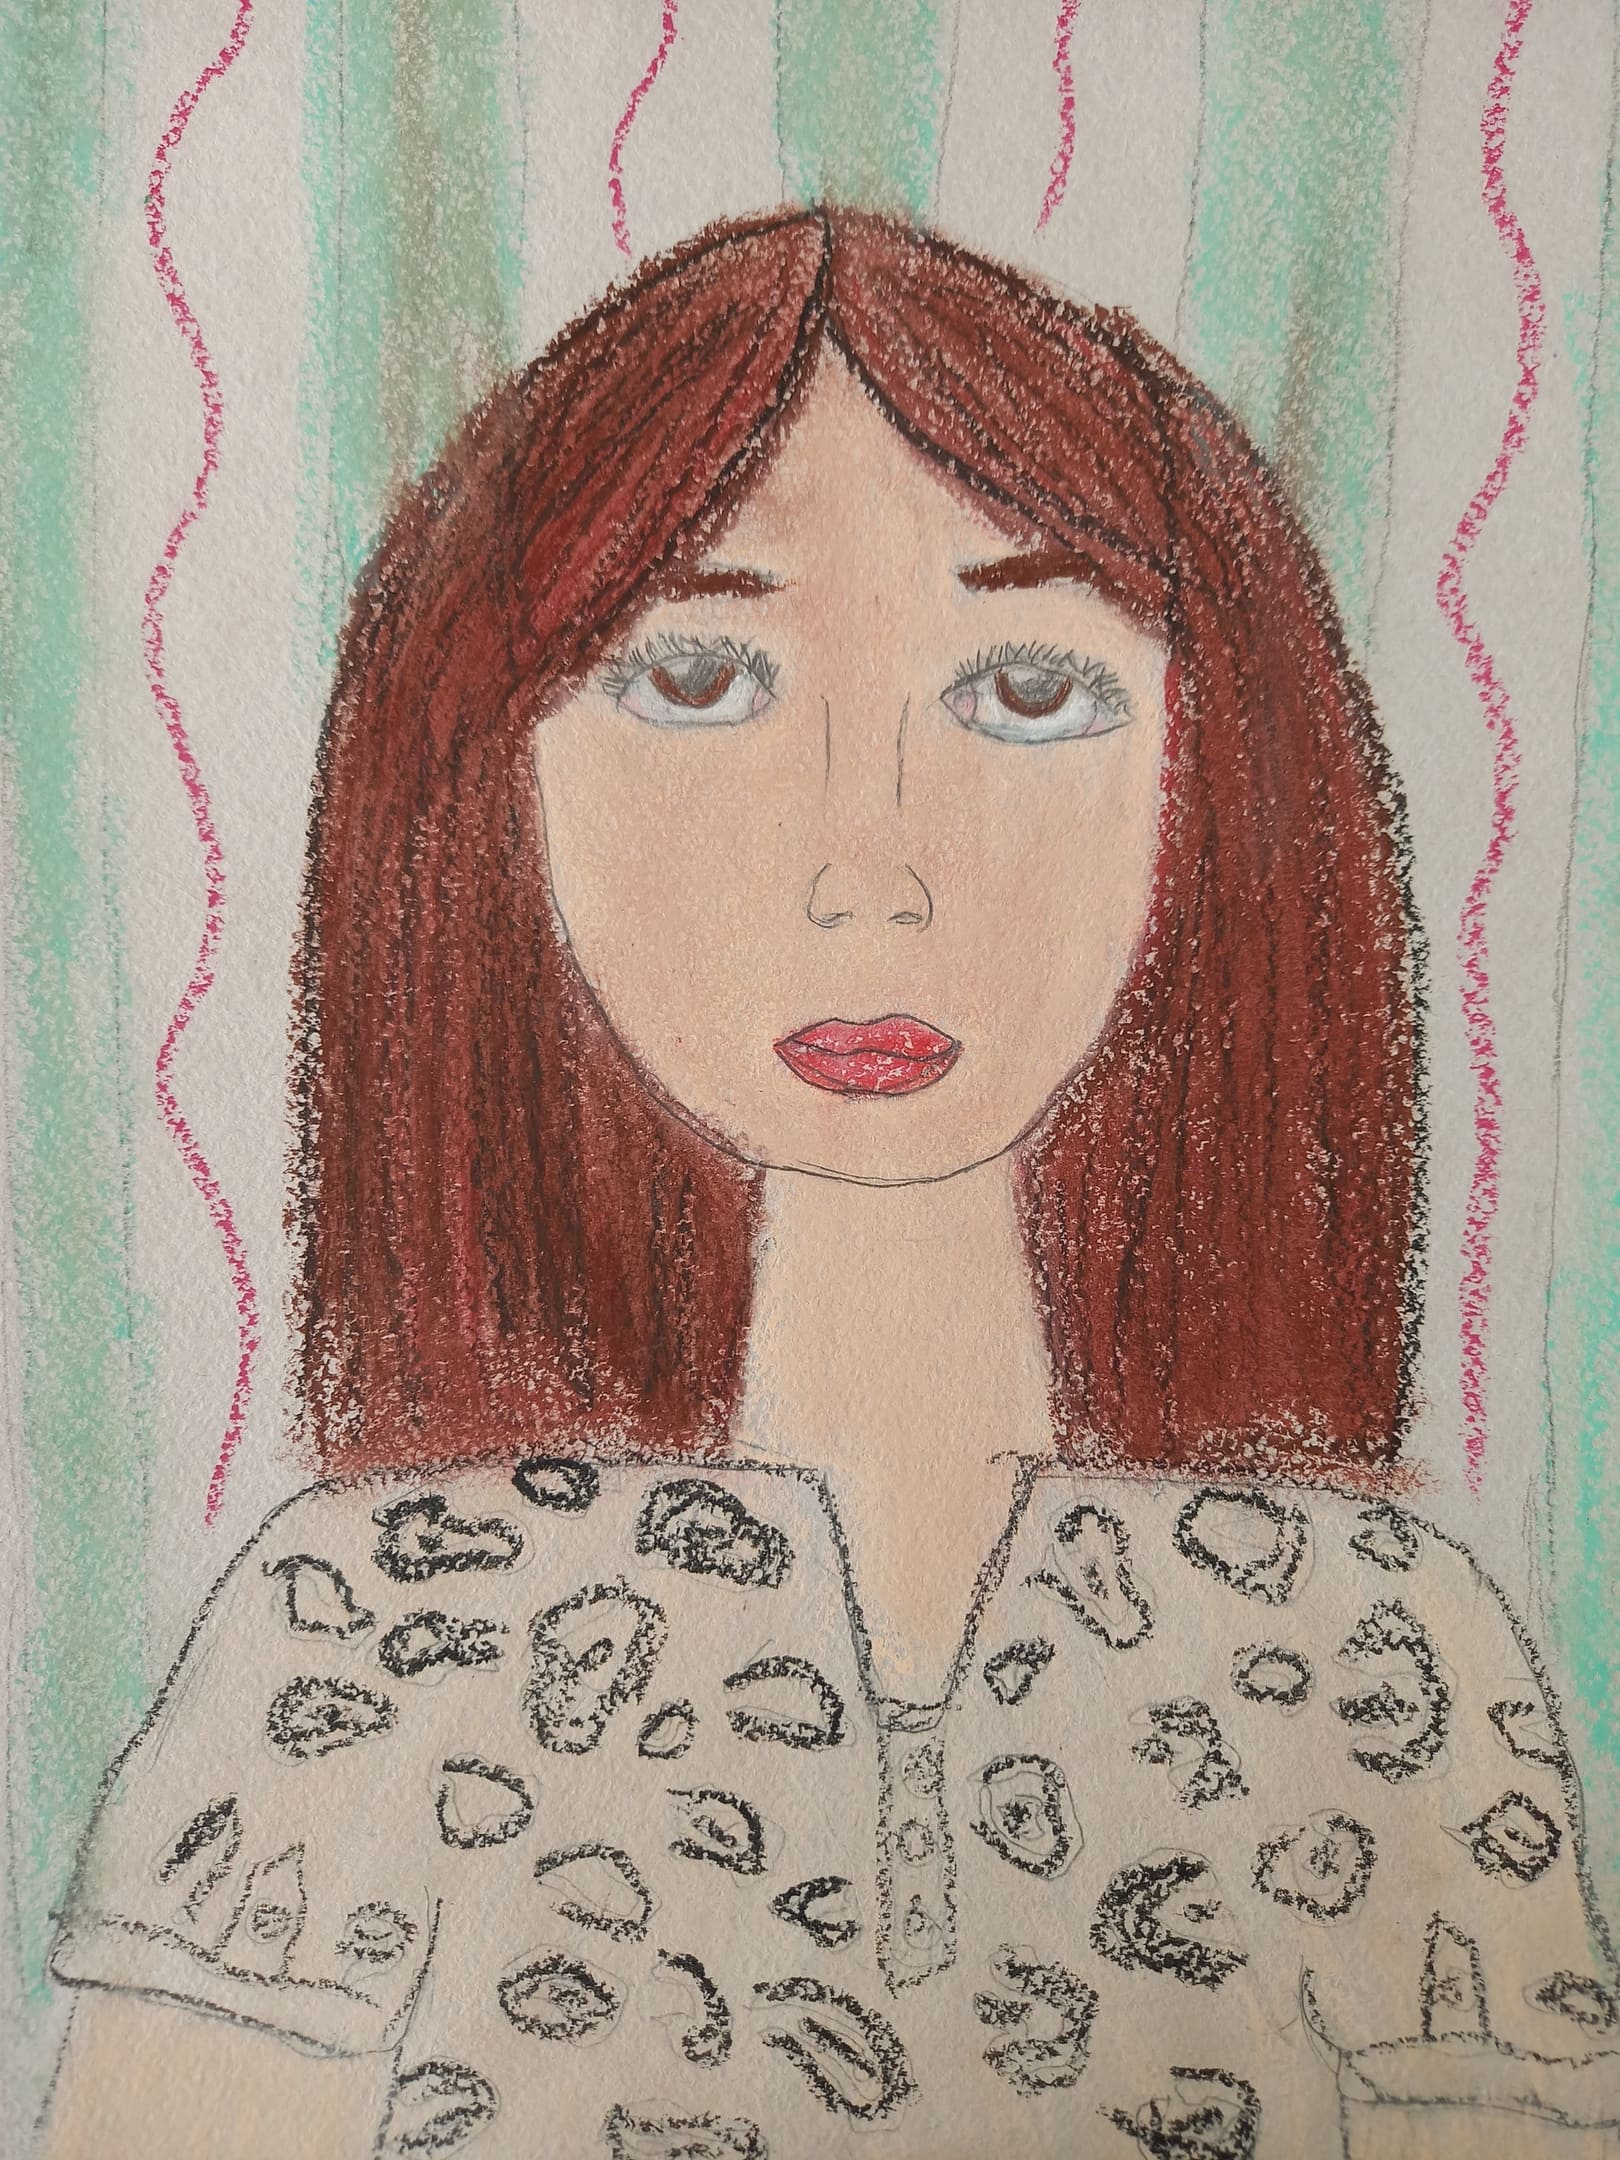 Тихонова Варвара, 9 лет